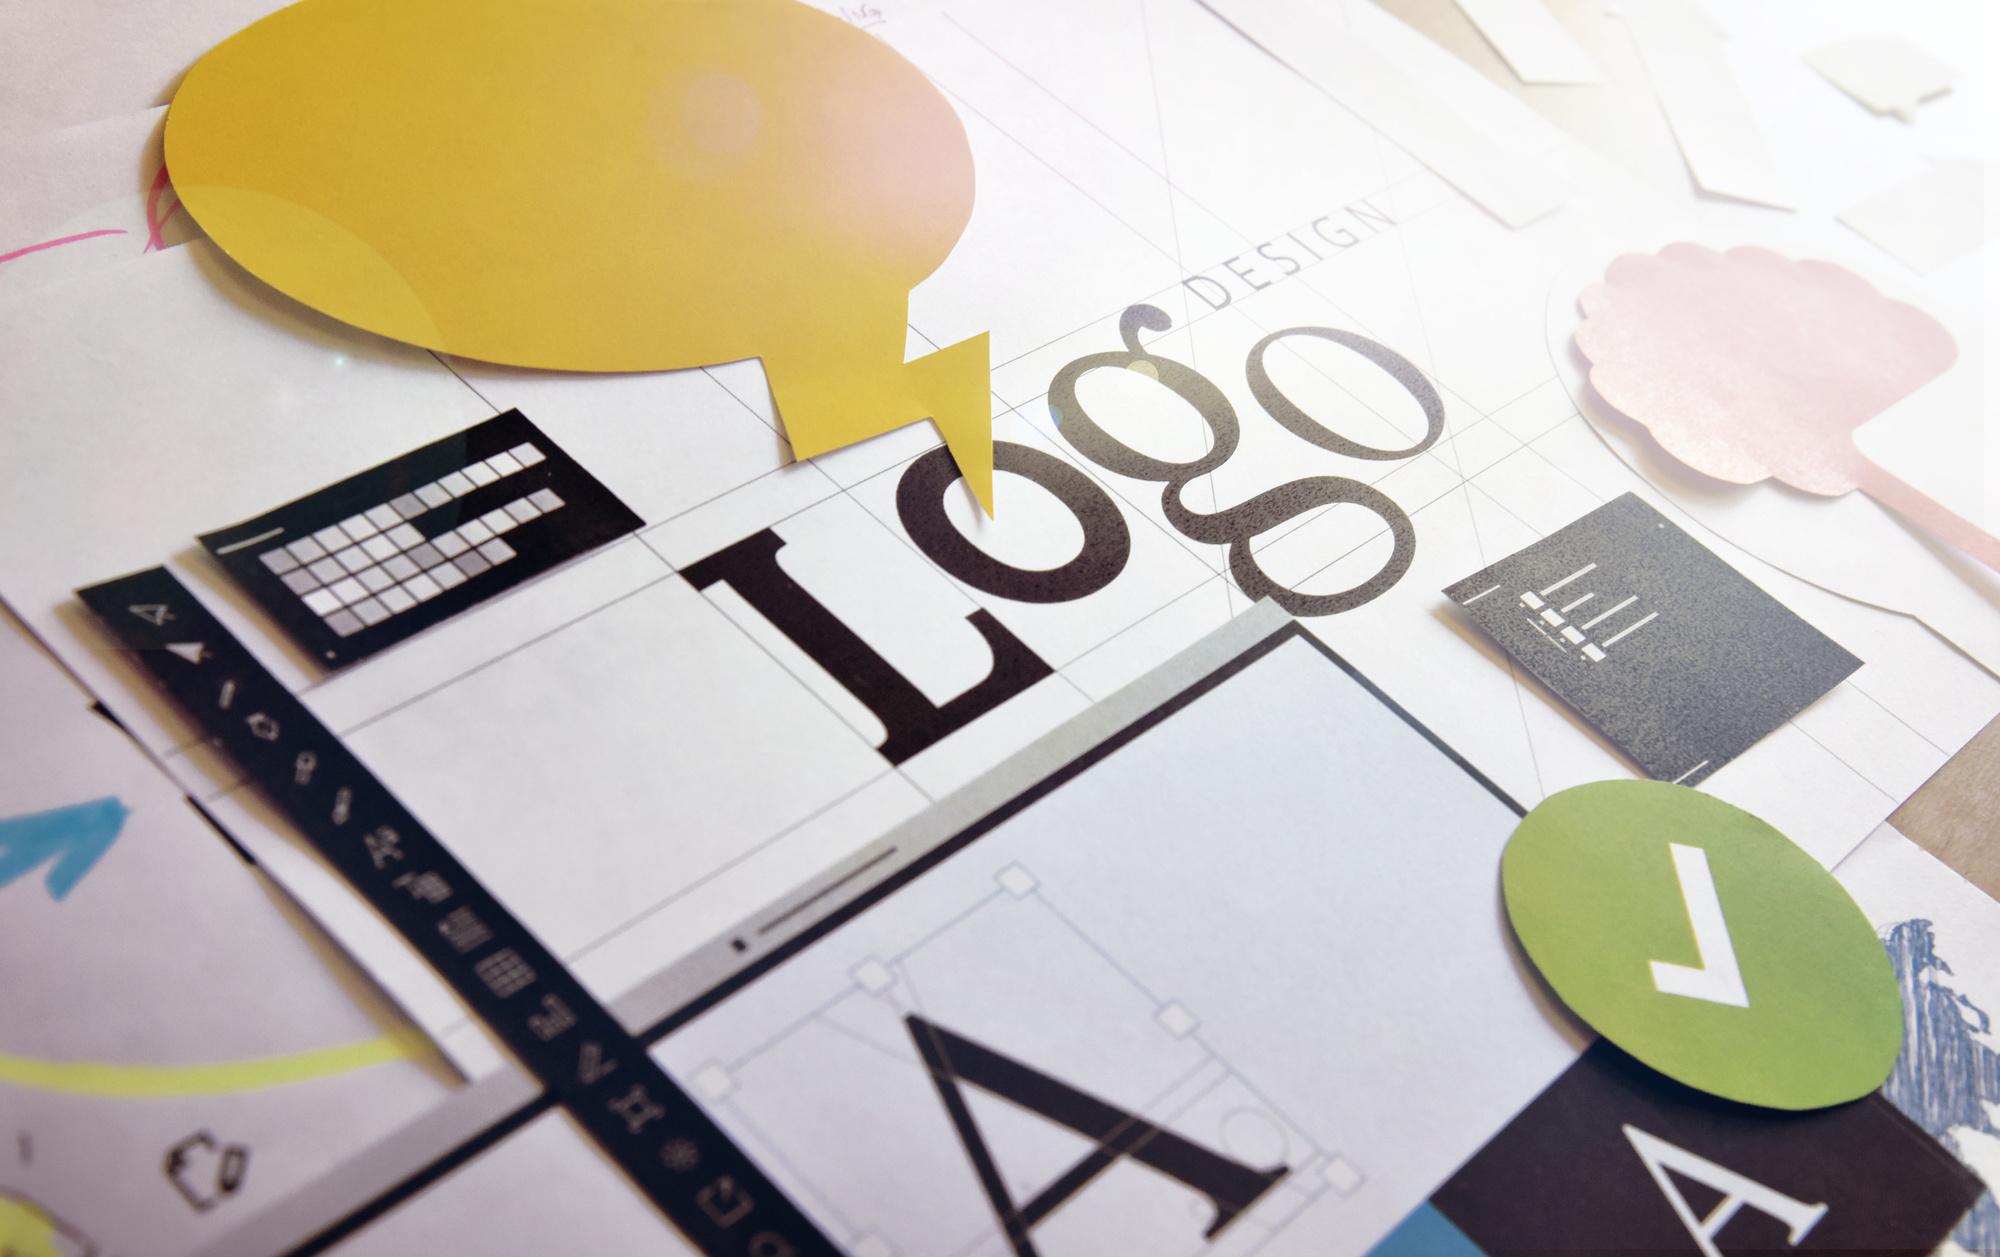 use of logos